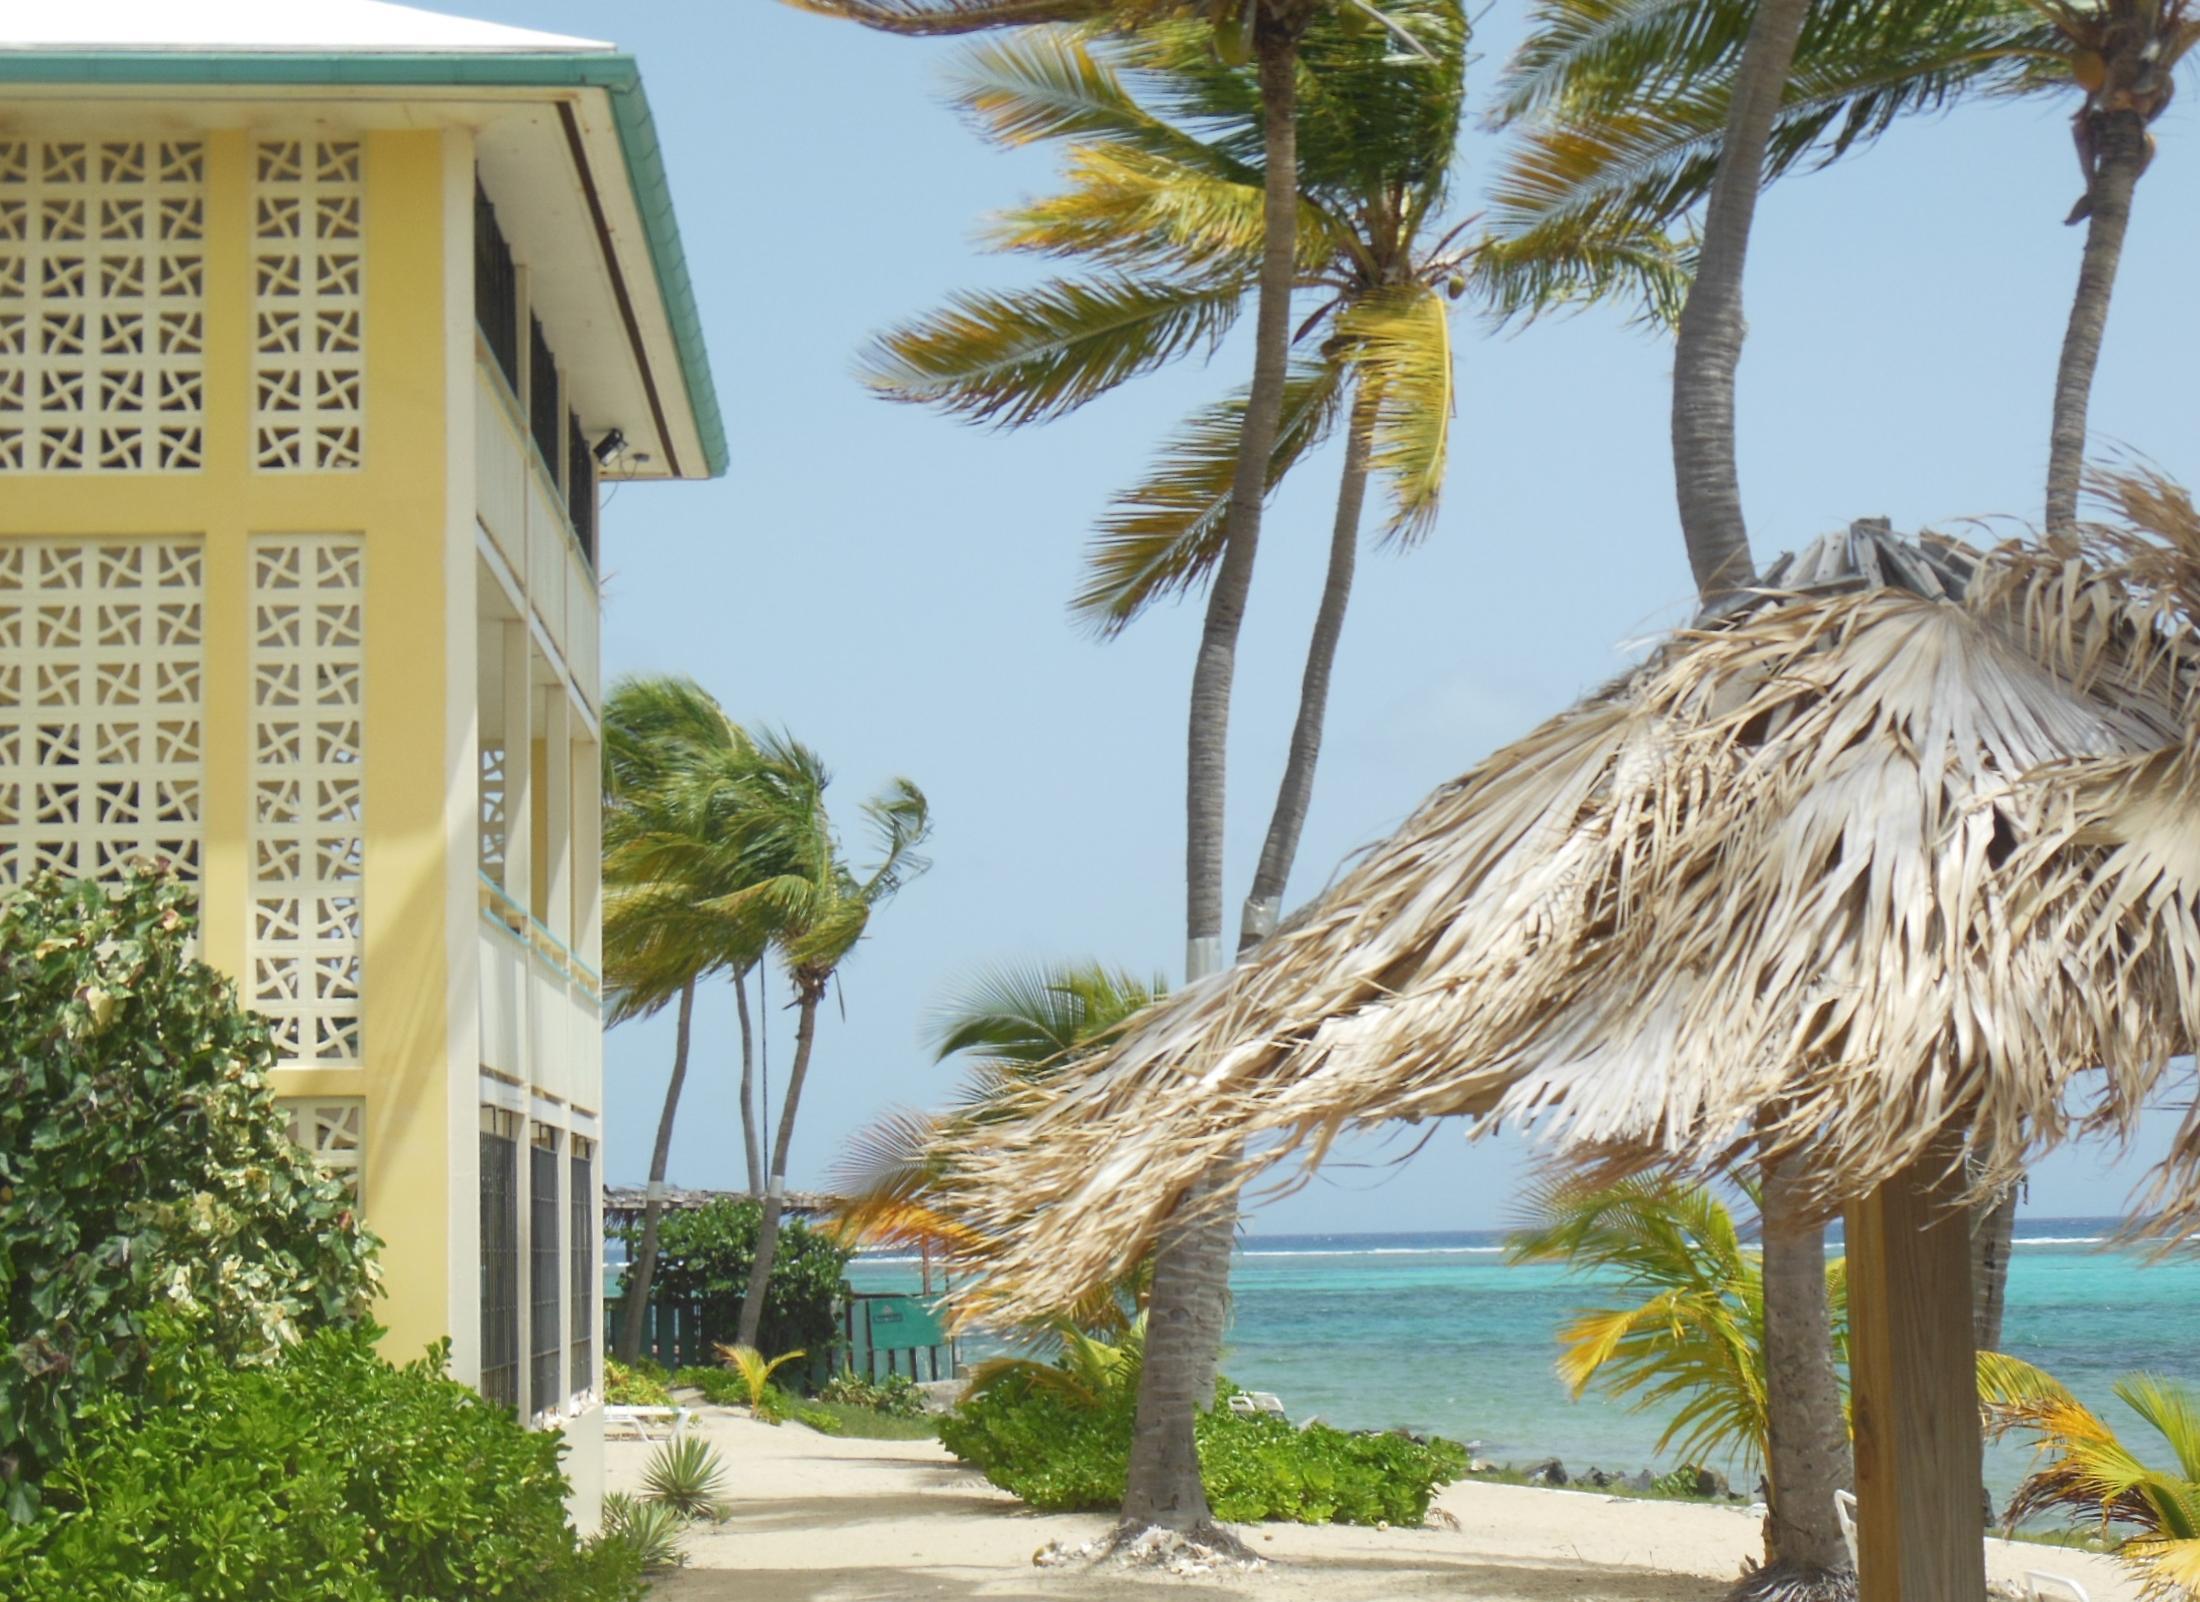 RE/MAX real estate, US Virgin Islands, Golden Rock Estate, Price Reduced  Condominiums  Golden Rock CO